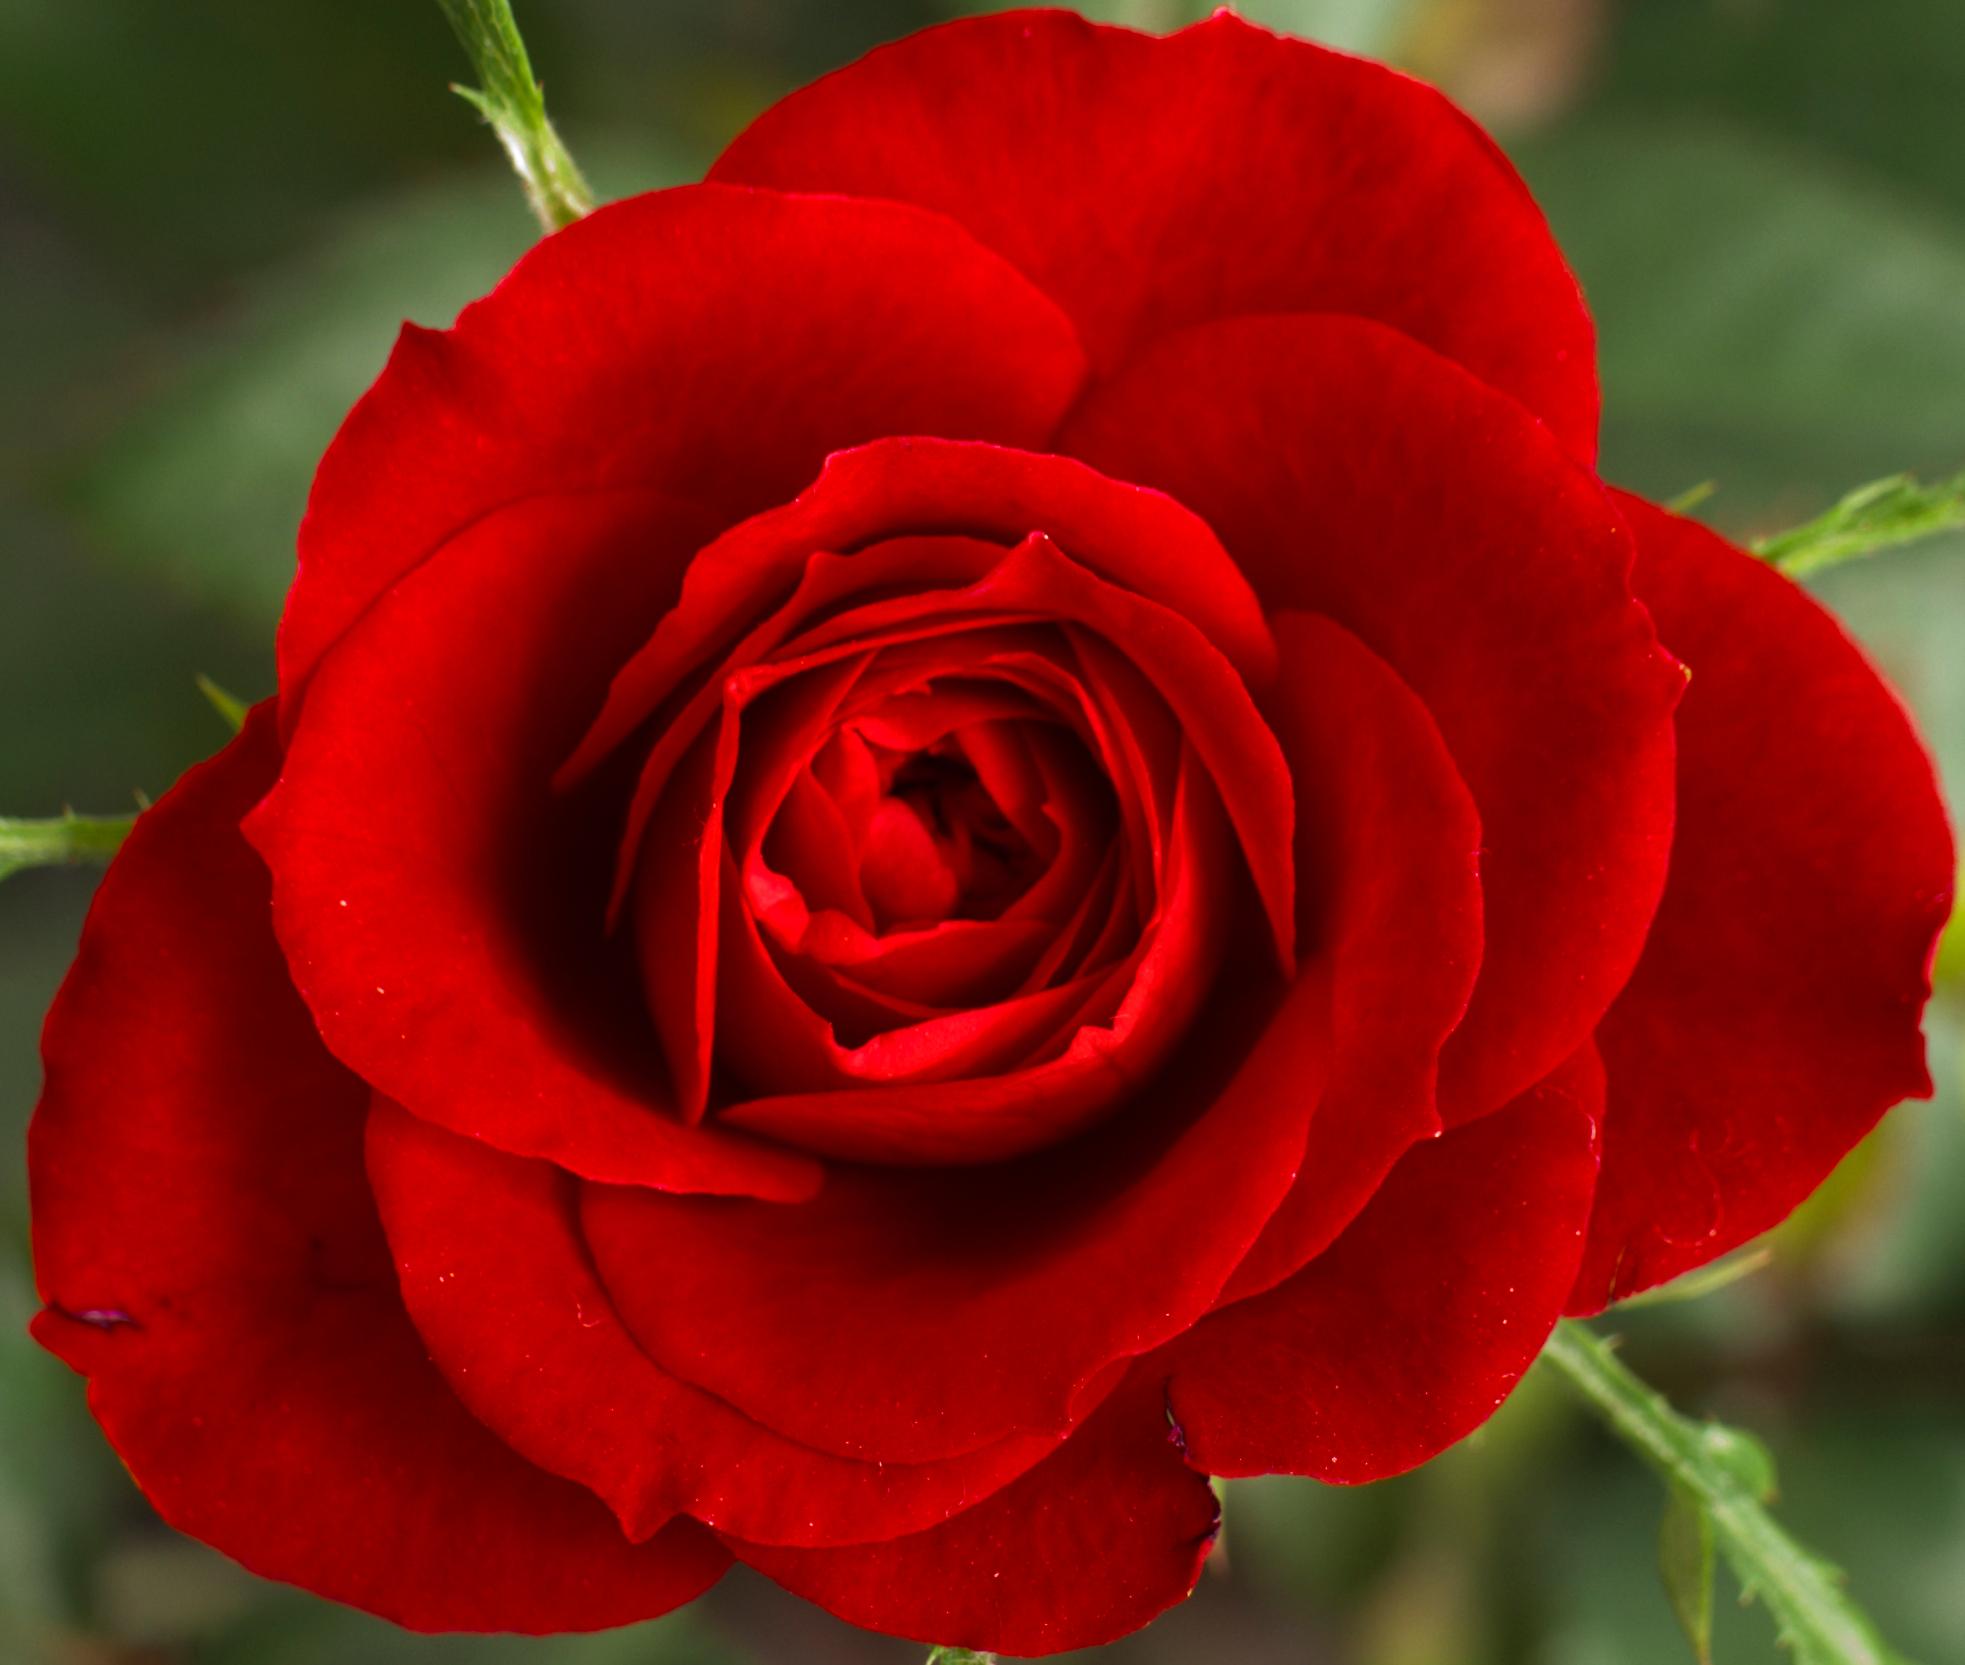 Postavi sliku i zatrazi sledecu - Page 17 Cropped_Small_Red_Rose